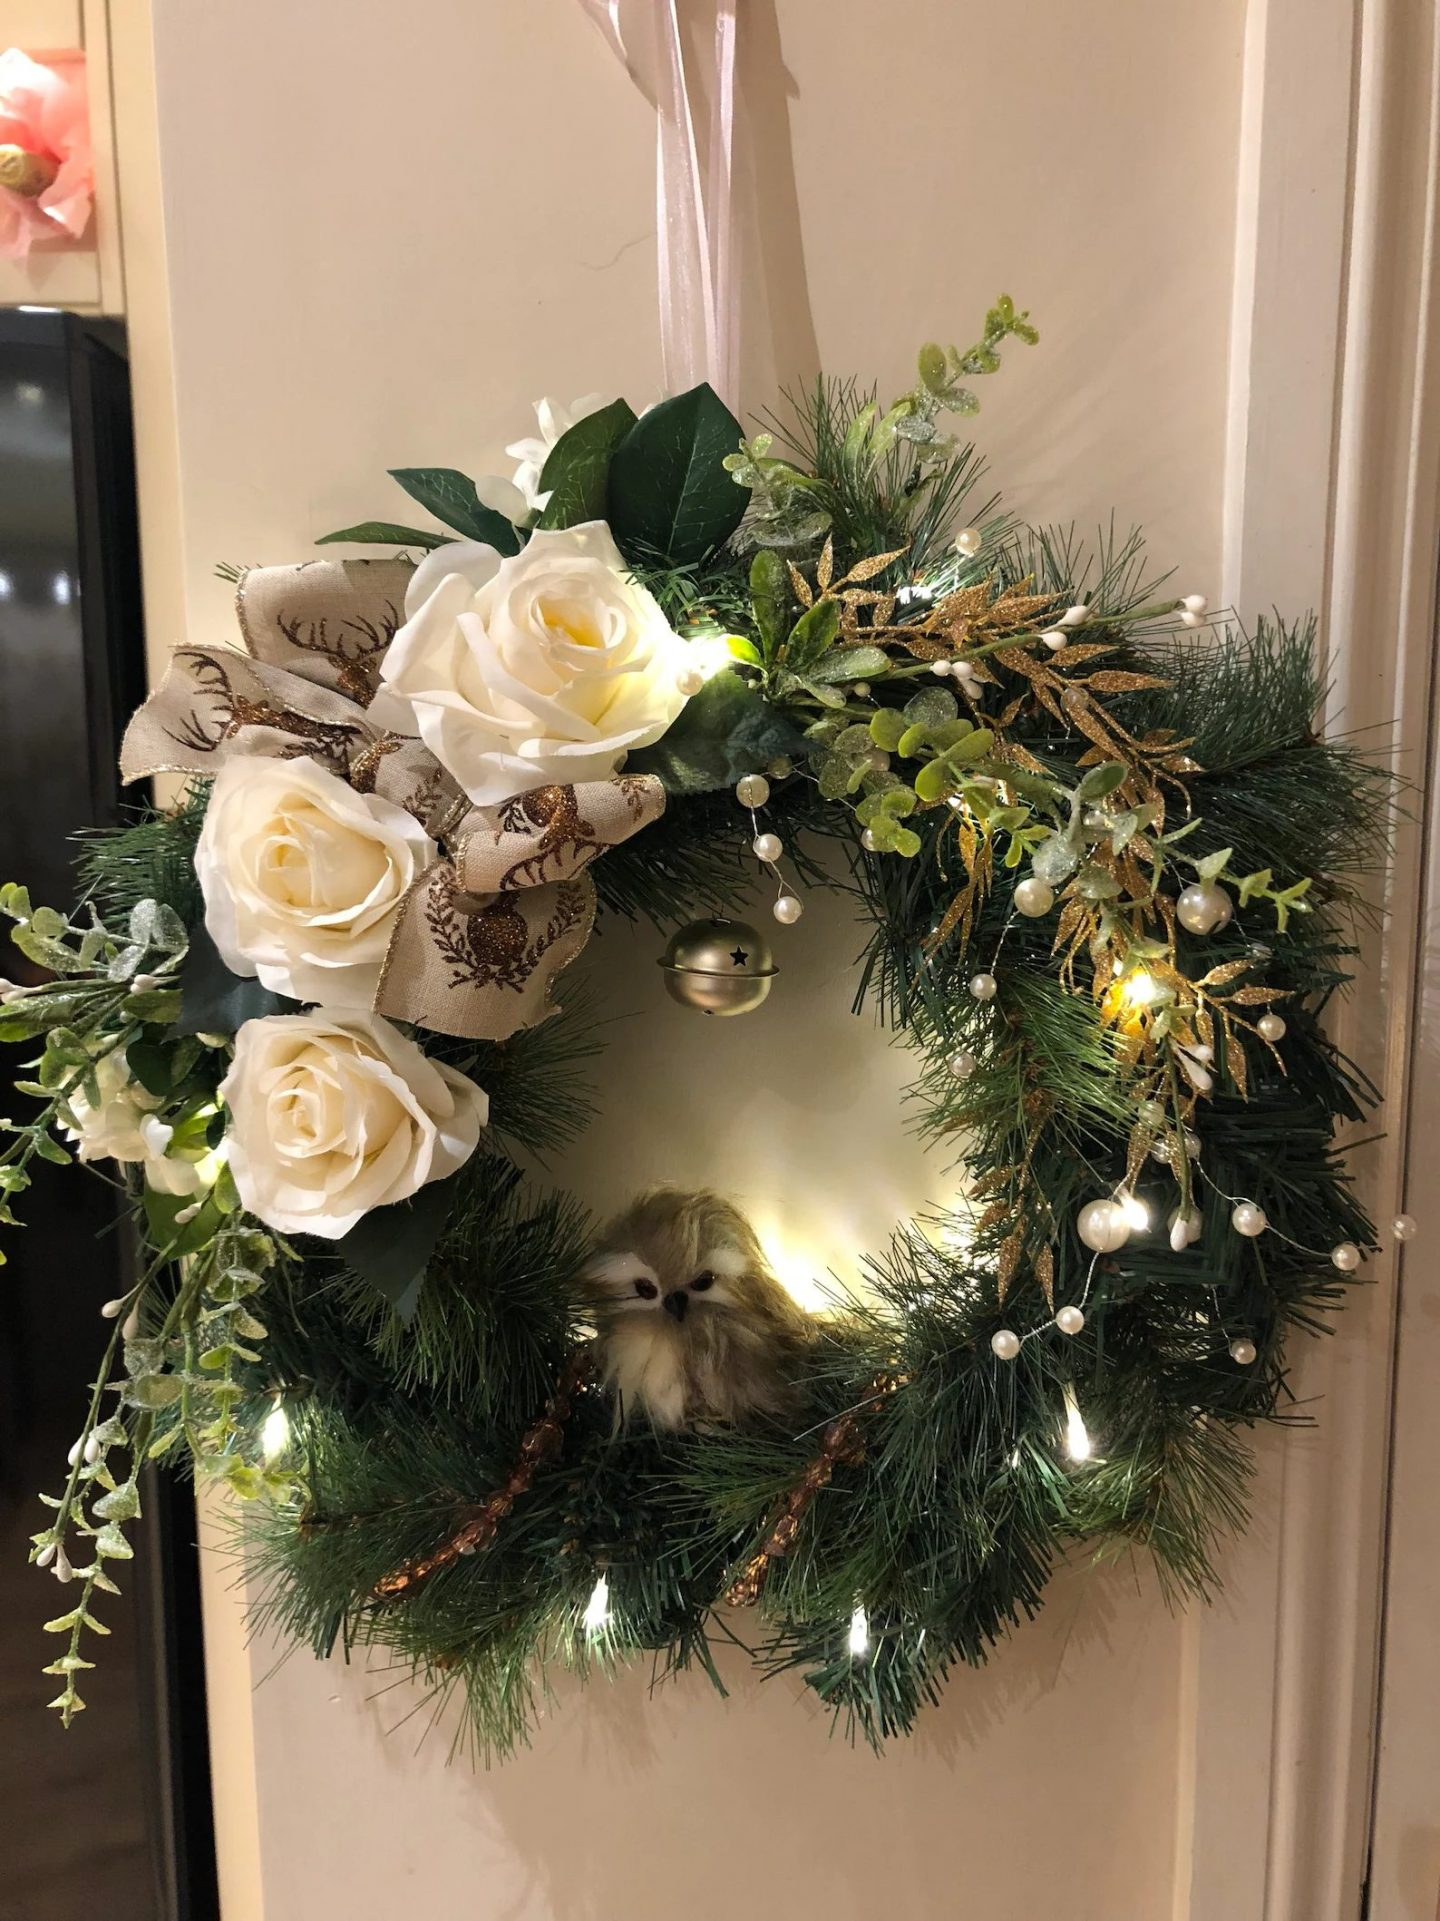 Custom Christmas wreath with centerpiece and bow